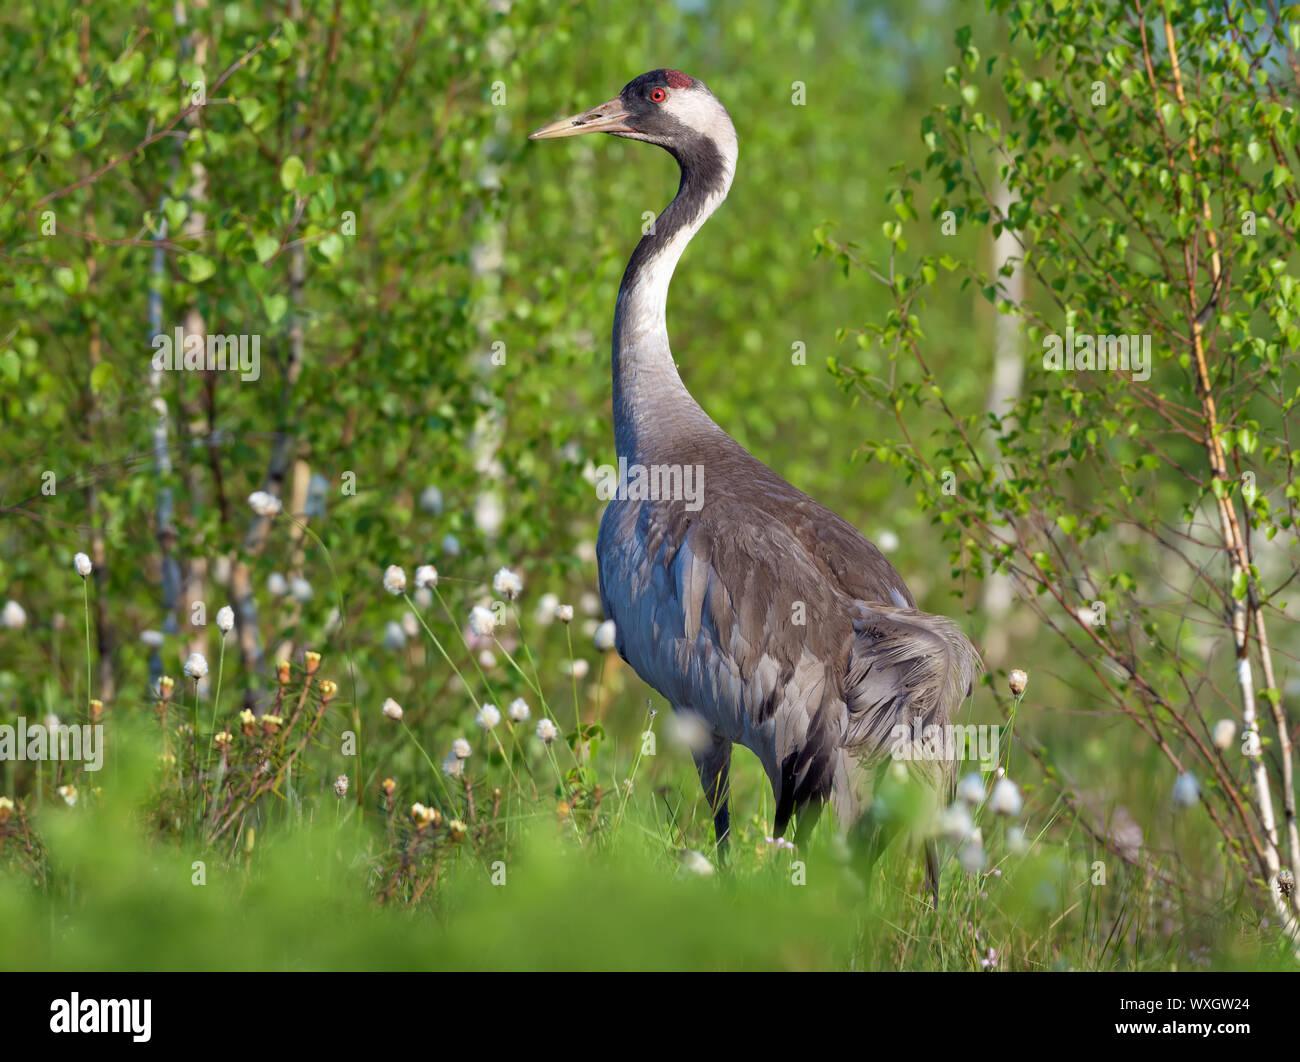 Common Crane stands for back view in green marsh breeding habitat Stock Photo